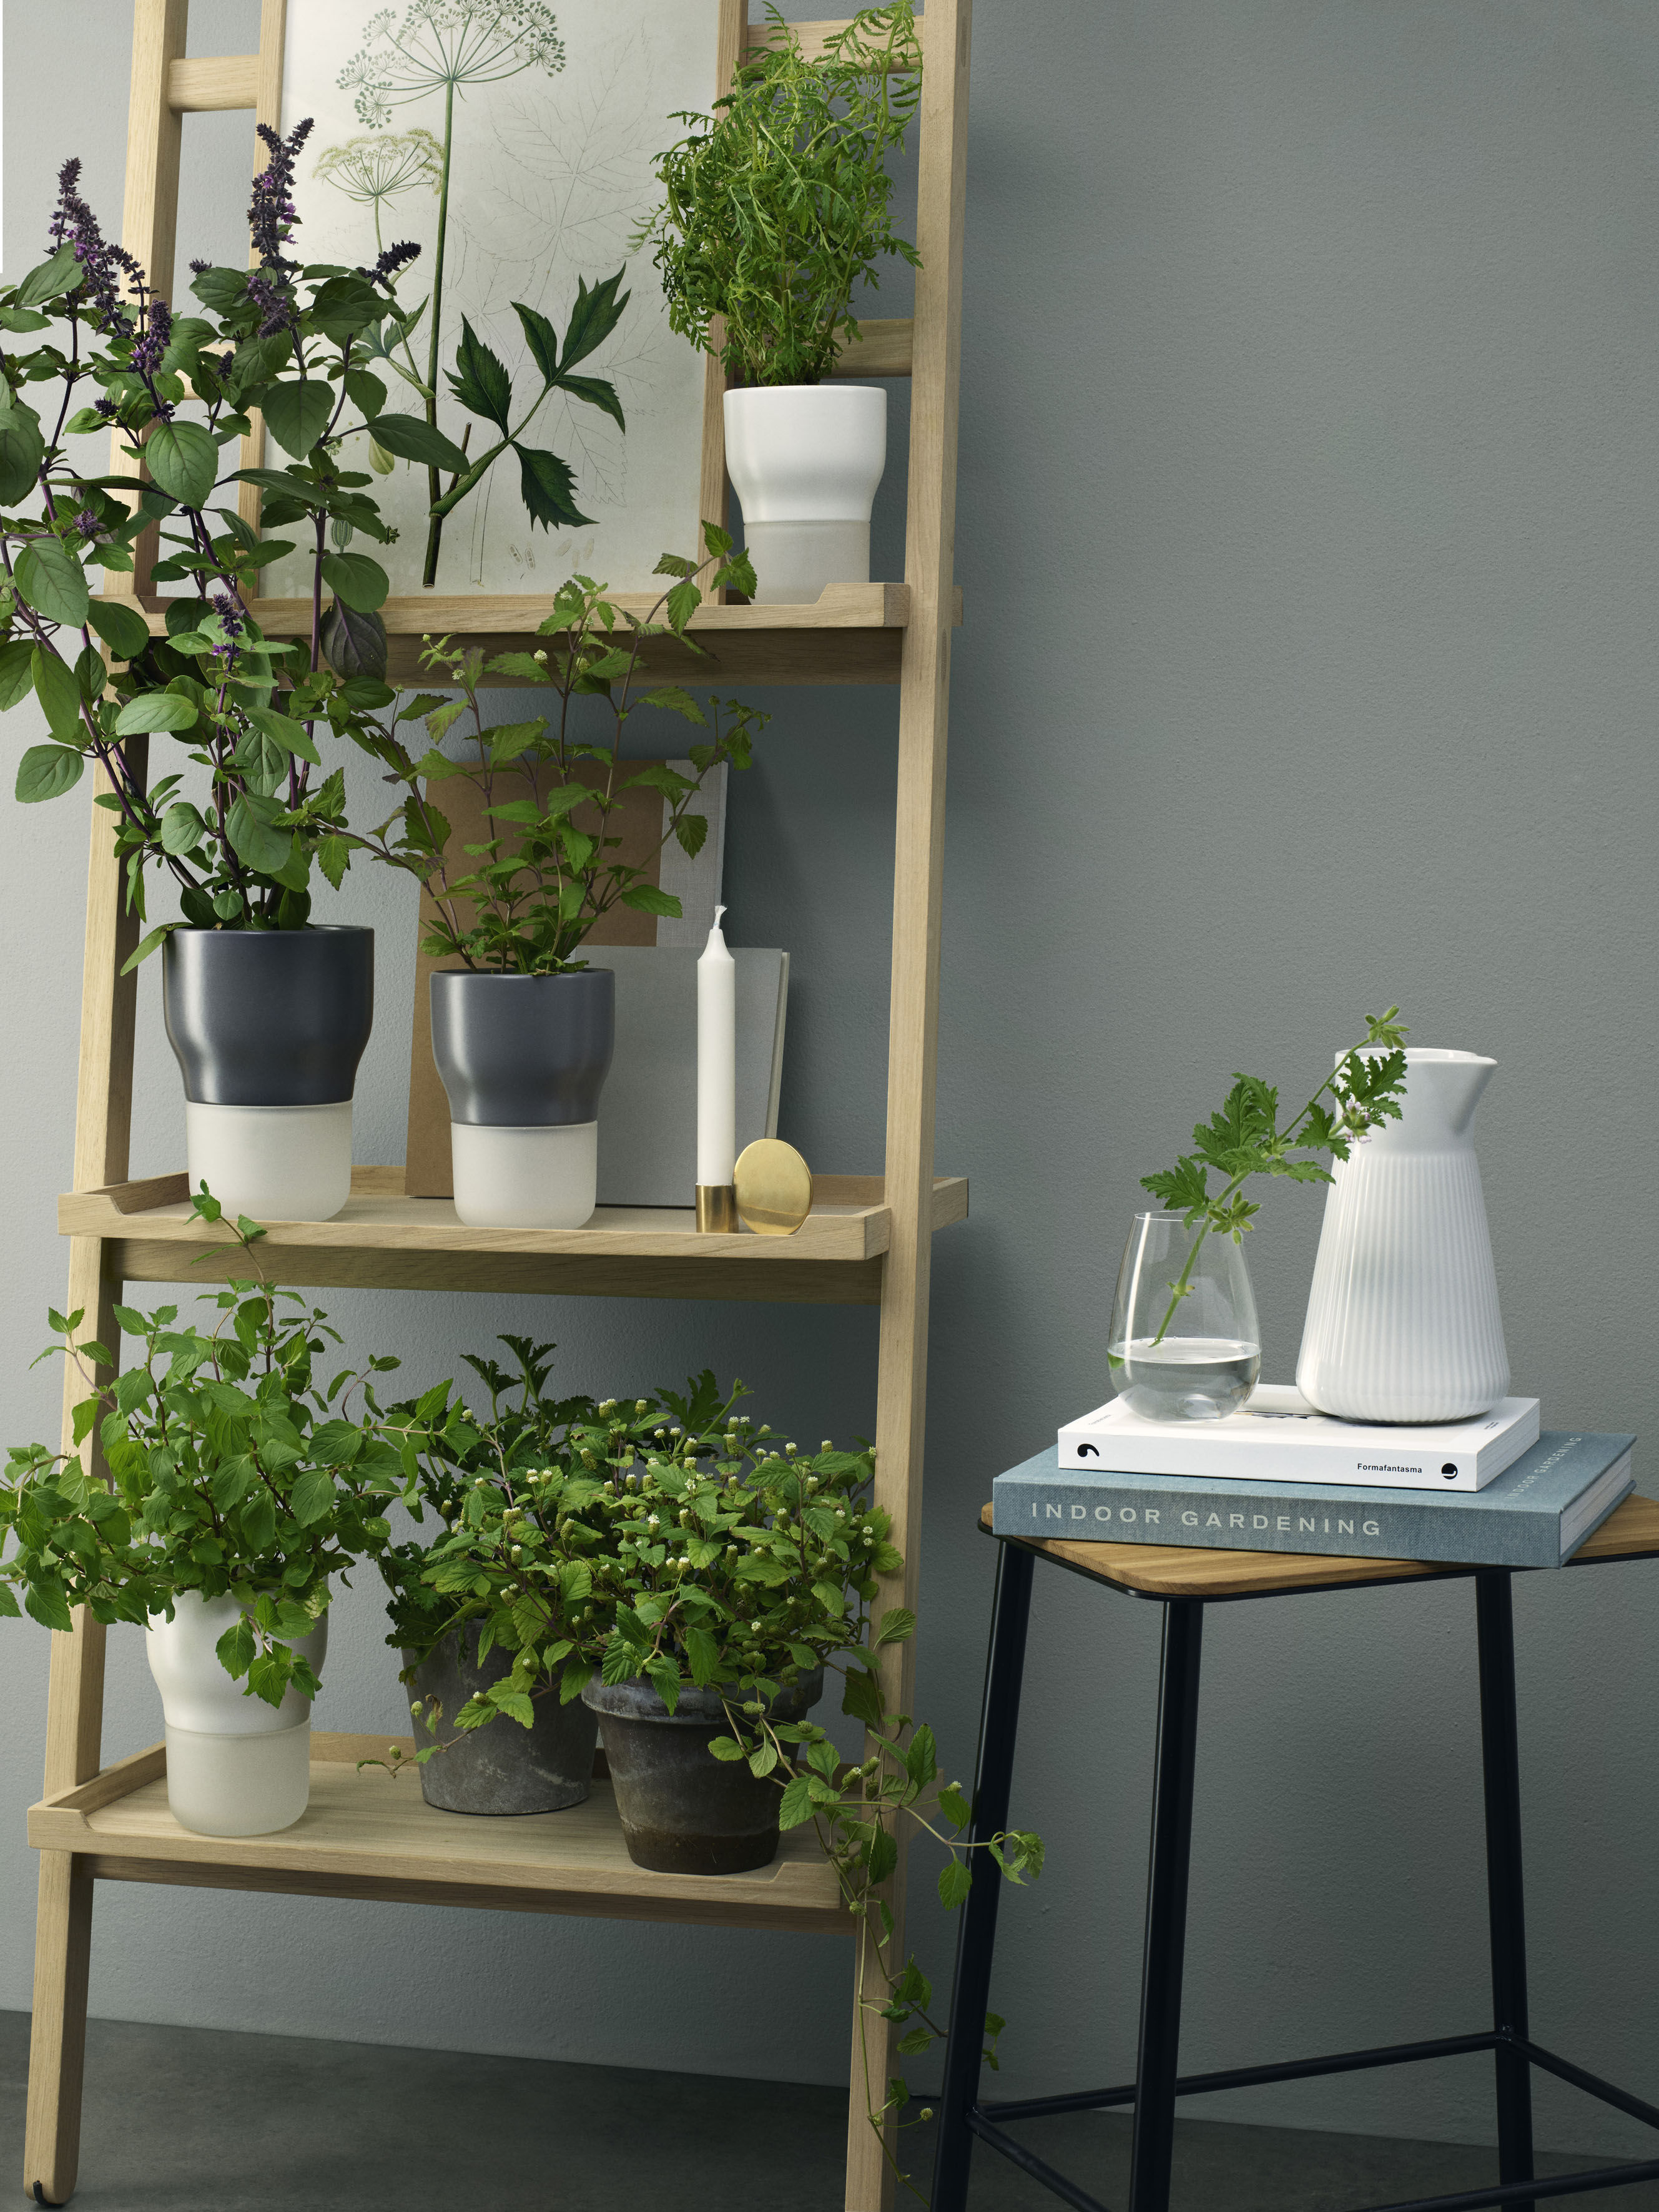 blumentopf mit wasserreservoir gr e s 9 cm x h 13 cm kreidewei by eva solo made in. Black Bedroom Furniture Sets. Home Design Ideas